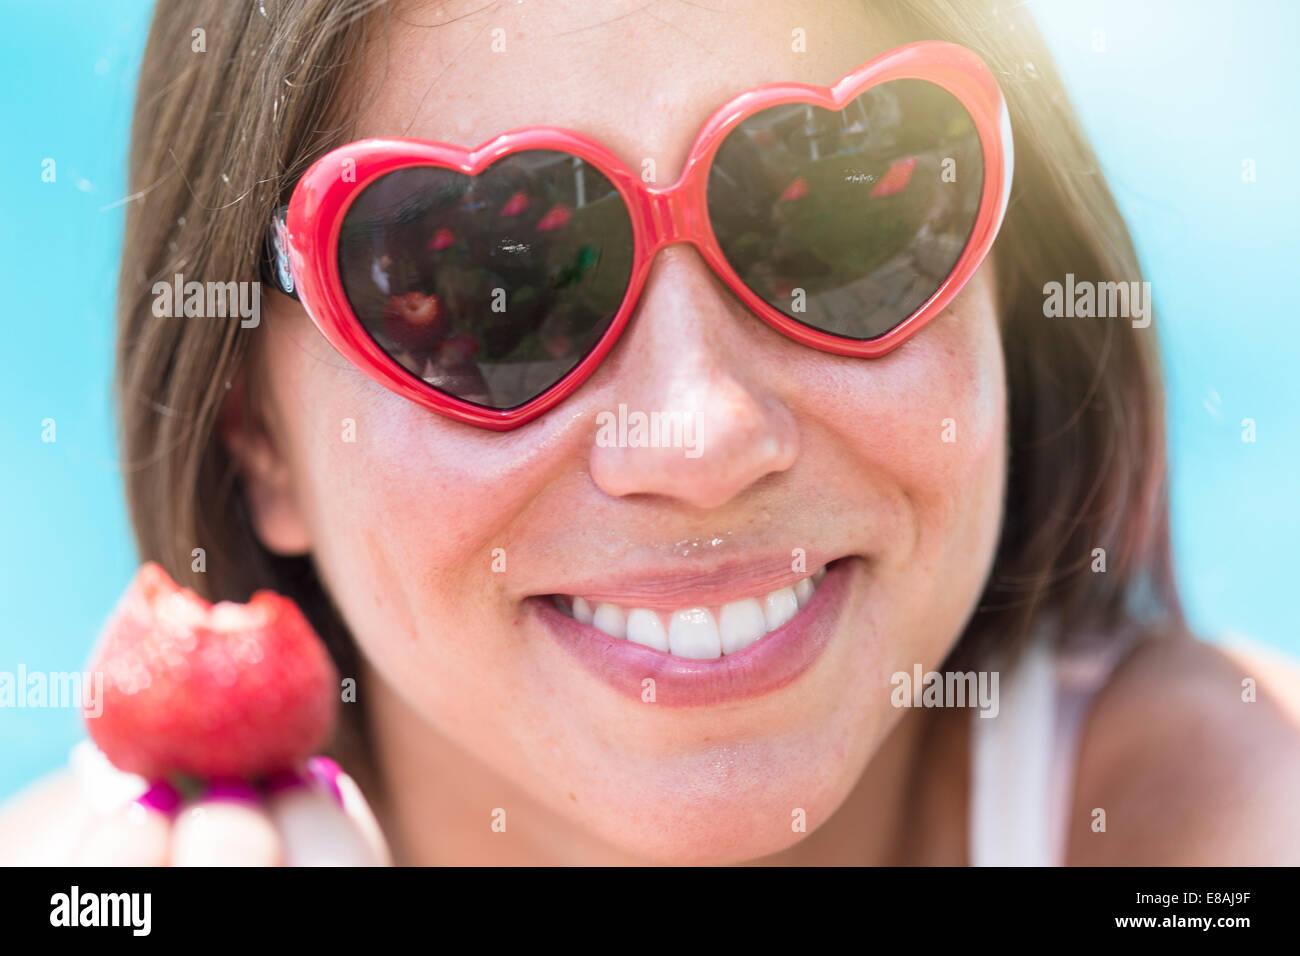 Close Up retrato de mujer joven comer fresas Imagen De Stock